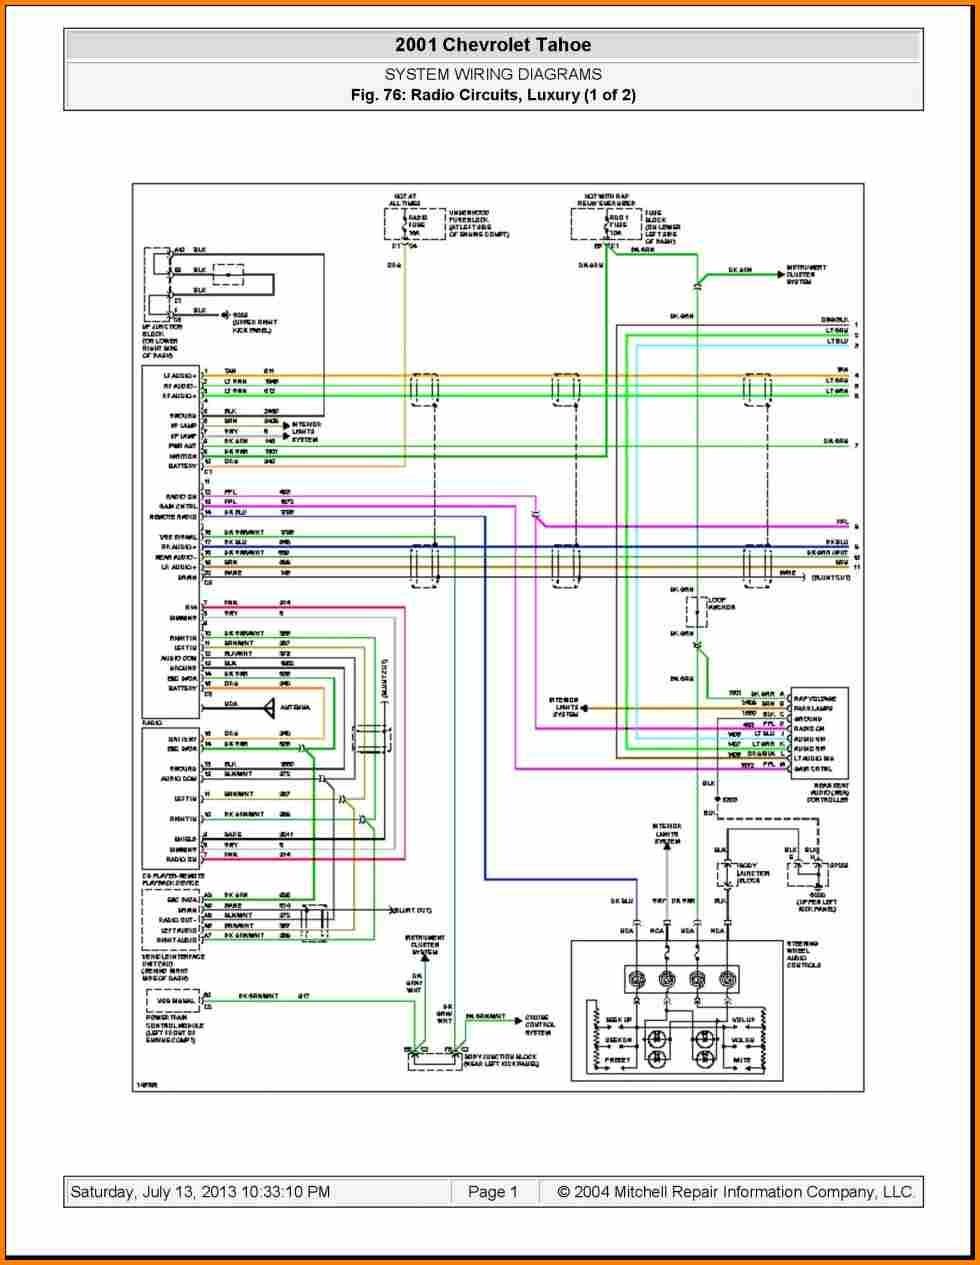 2003 Chevy Silverado Wiring Diagram 2004 Chevrolet Radio Get Free Template 2005 Gmc Sierra Bose Tail Light Quality 970—1255 For Stereo